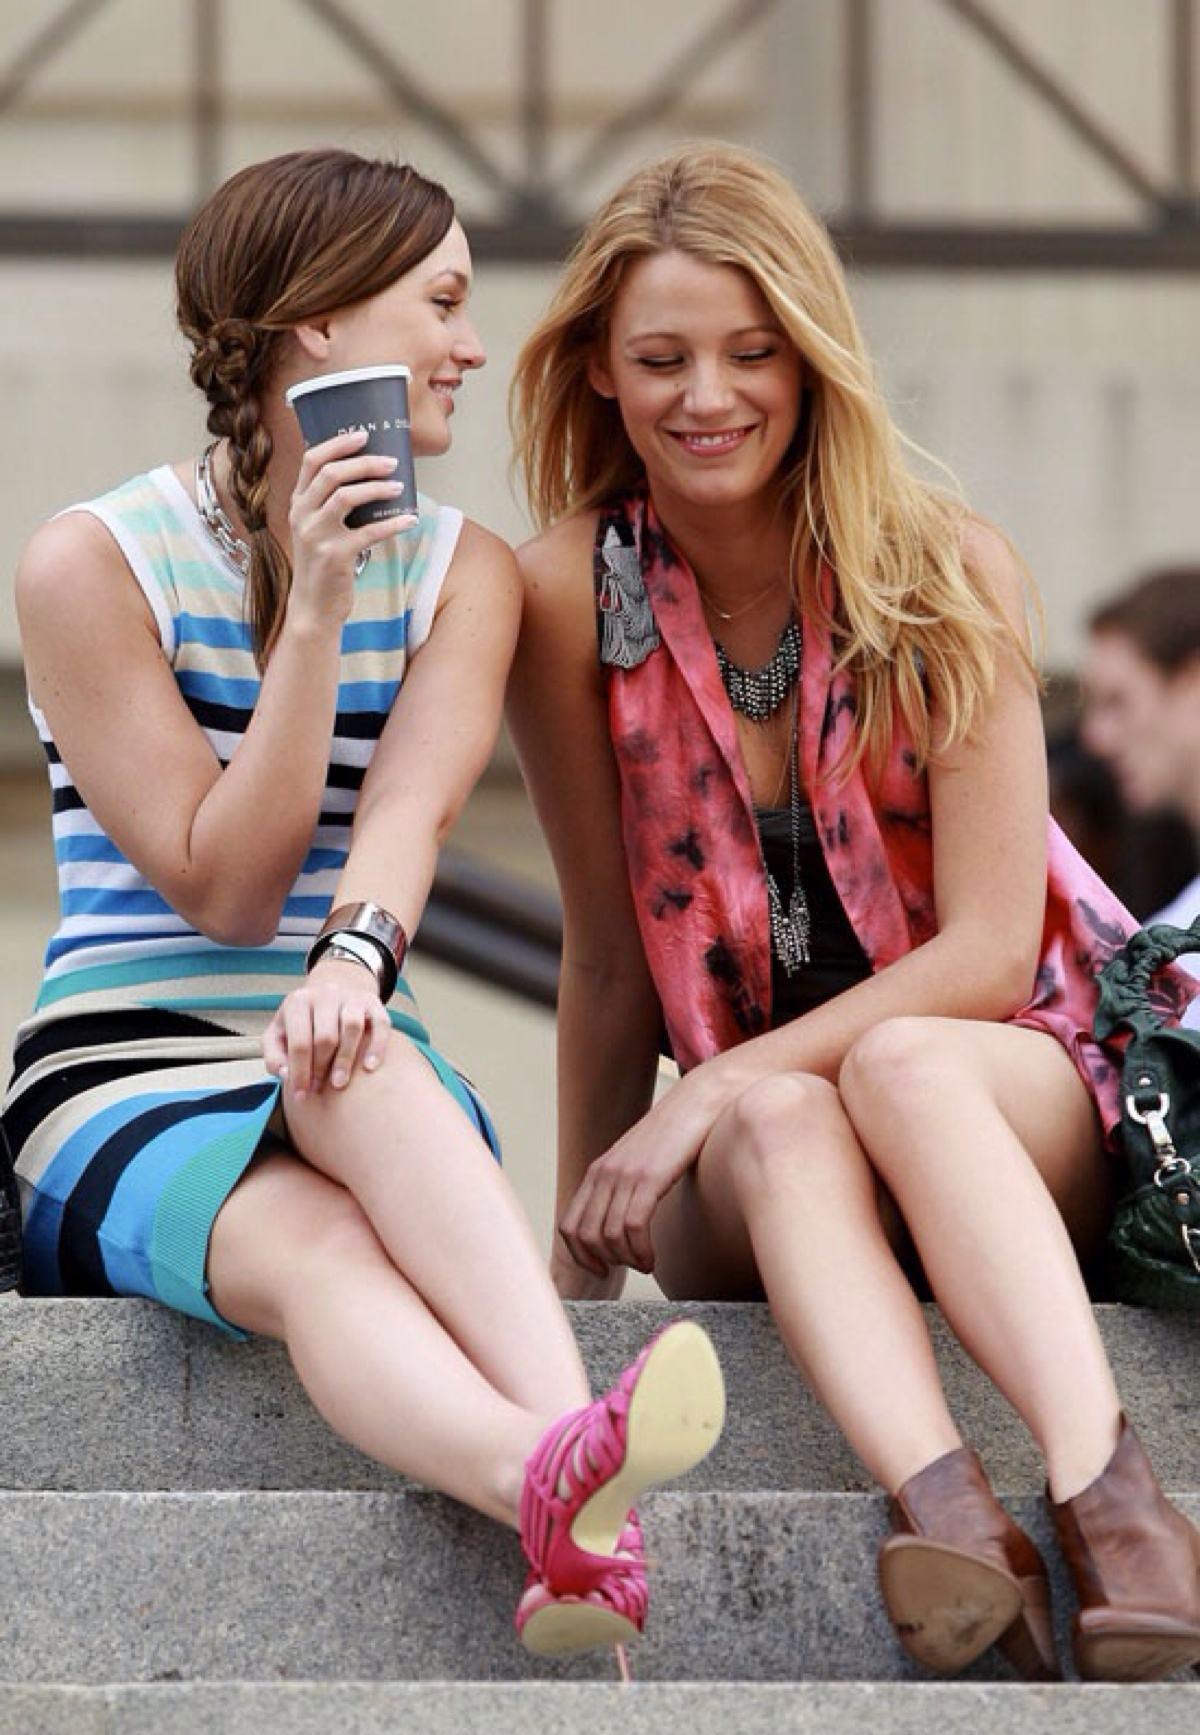 Fashion in gossip girl 27